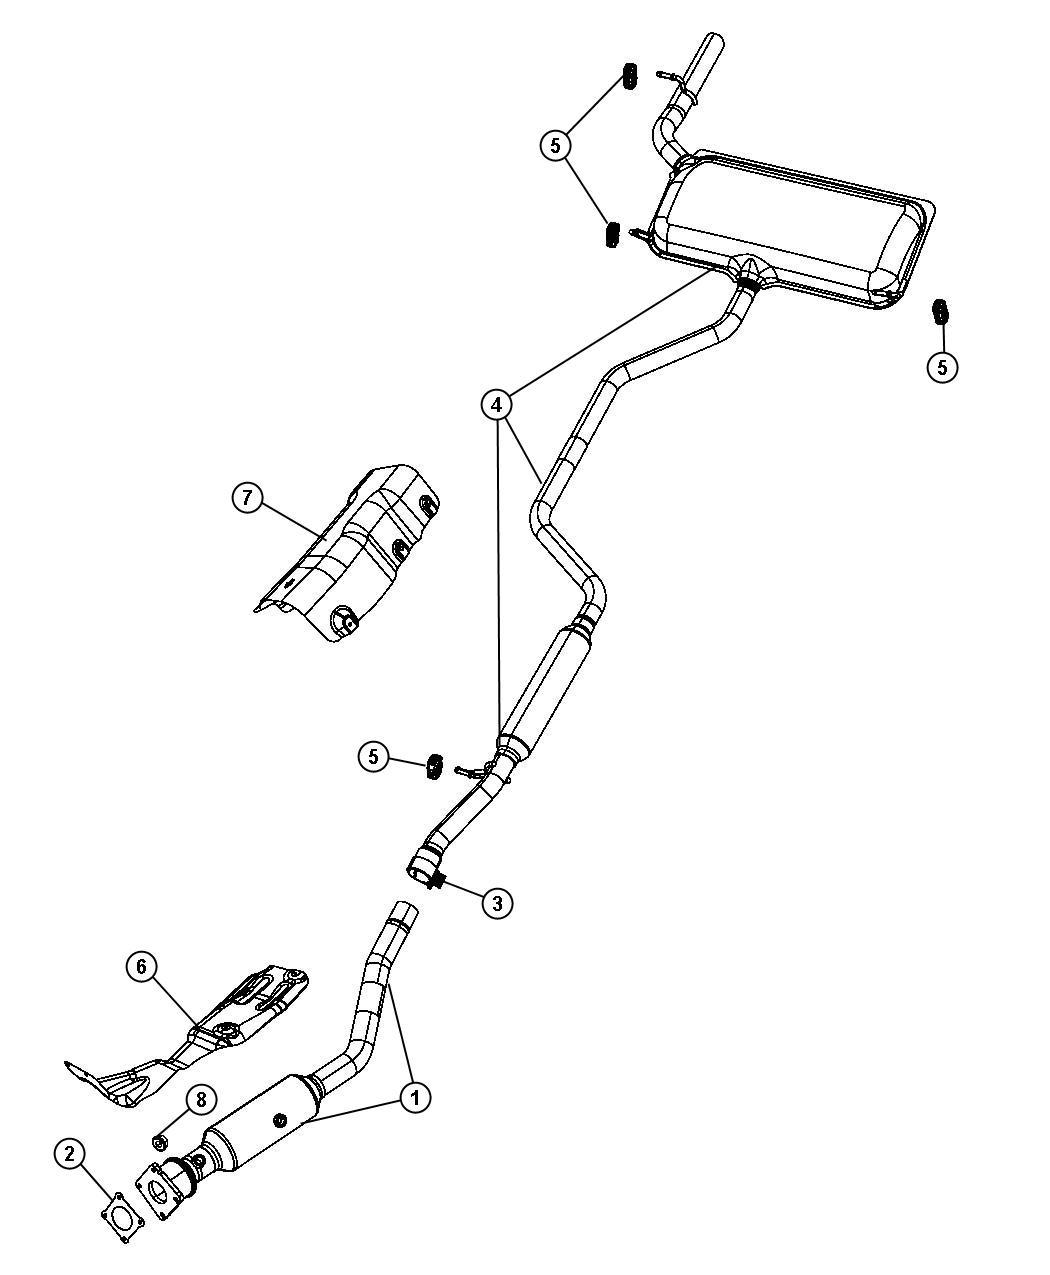 Dodge Journey Used For Muffler And Resonator Exhaust